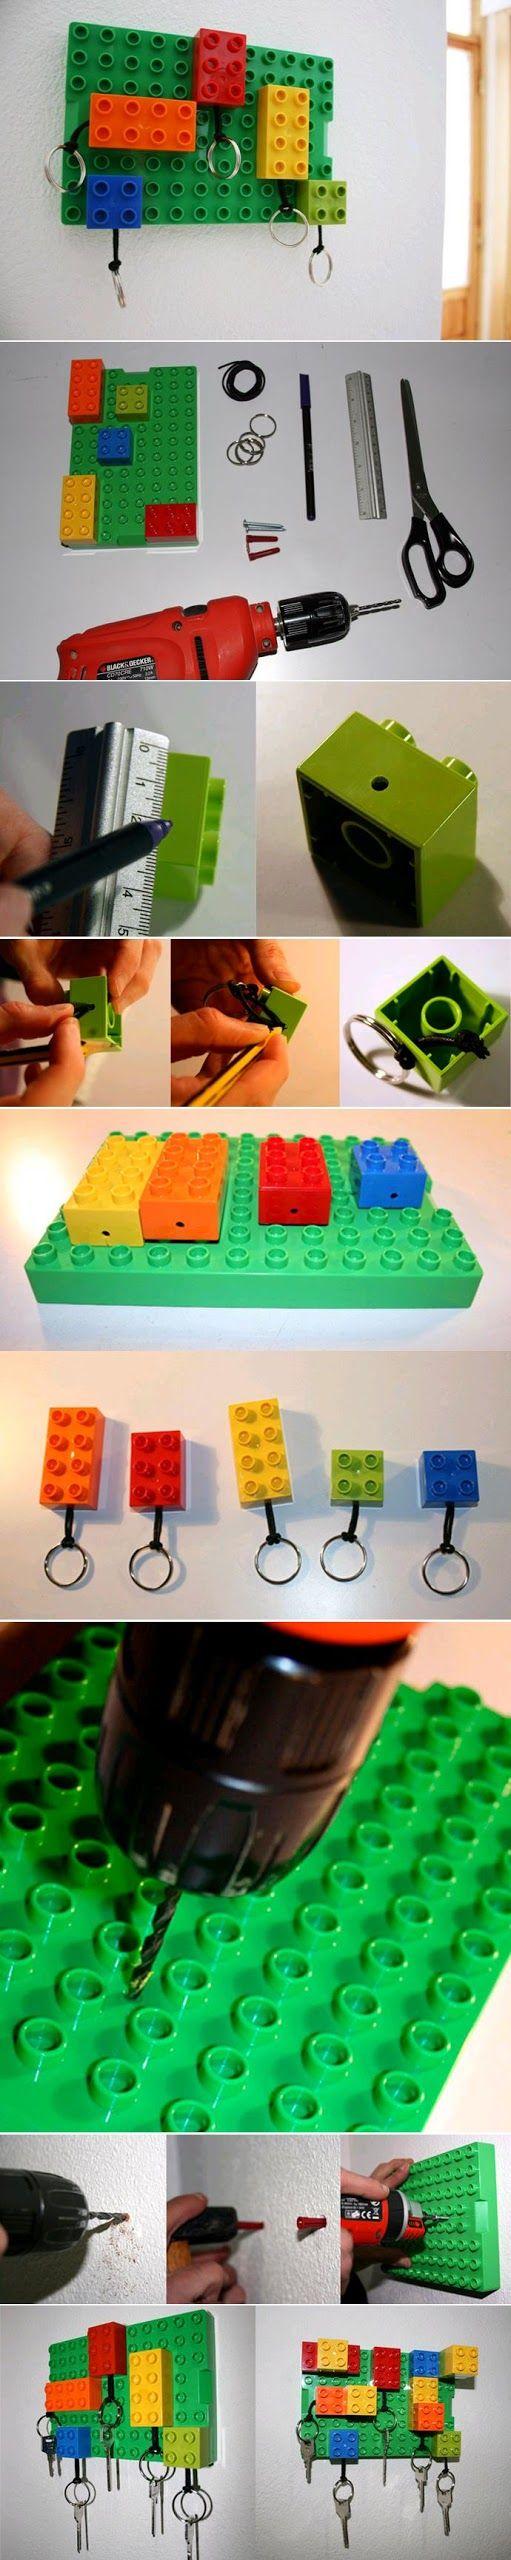 Diy : Lego Key Hanger Porta chaveiro! #DIY inteligente! rs ;)